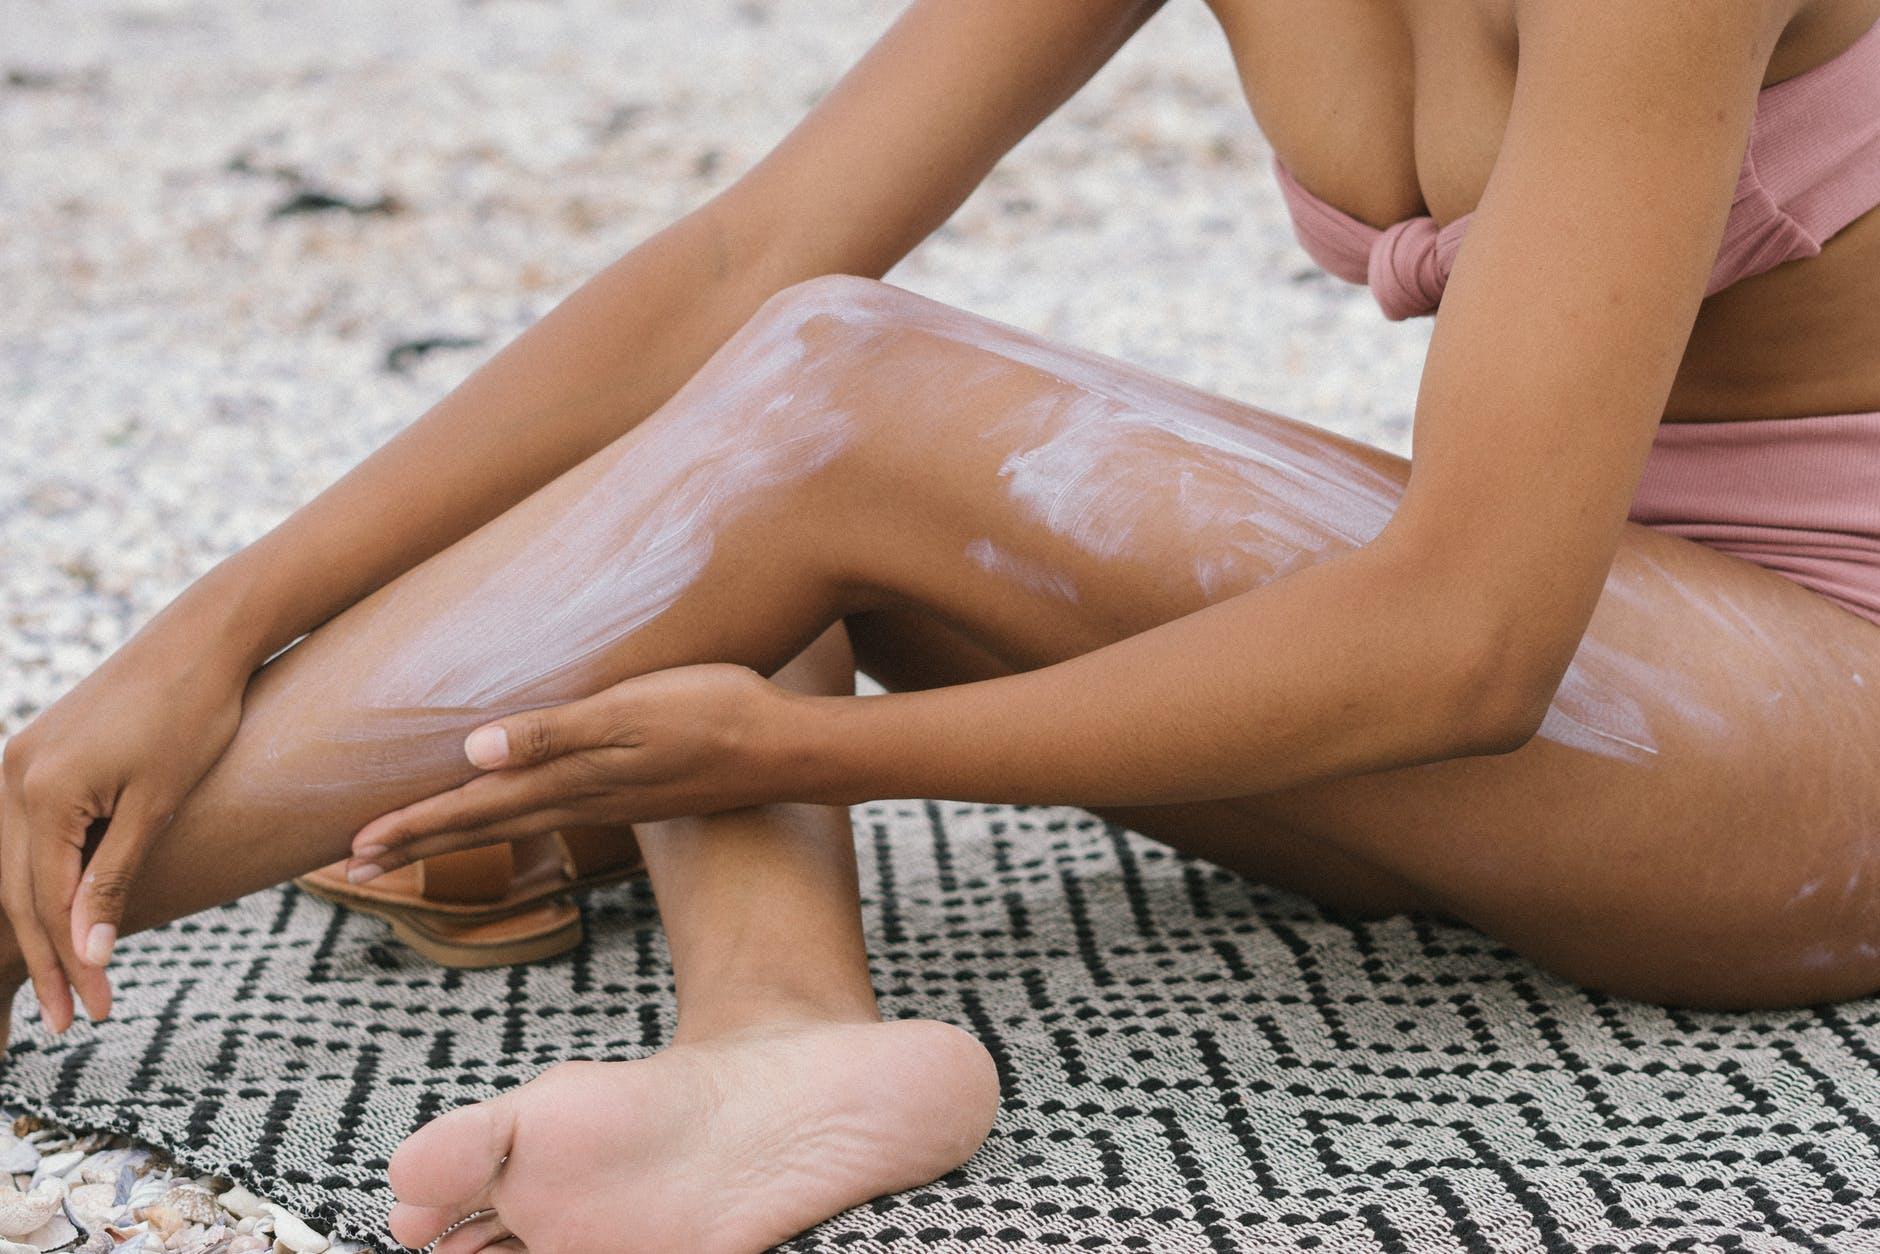 žena, nohy